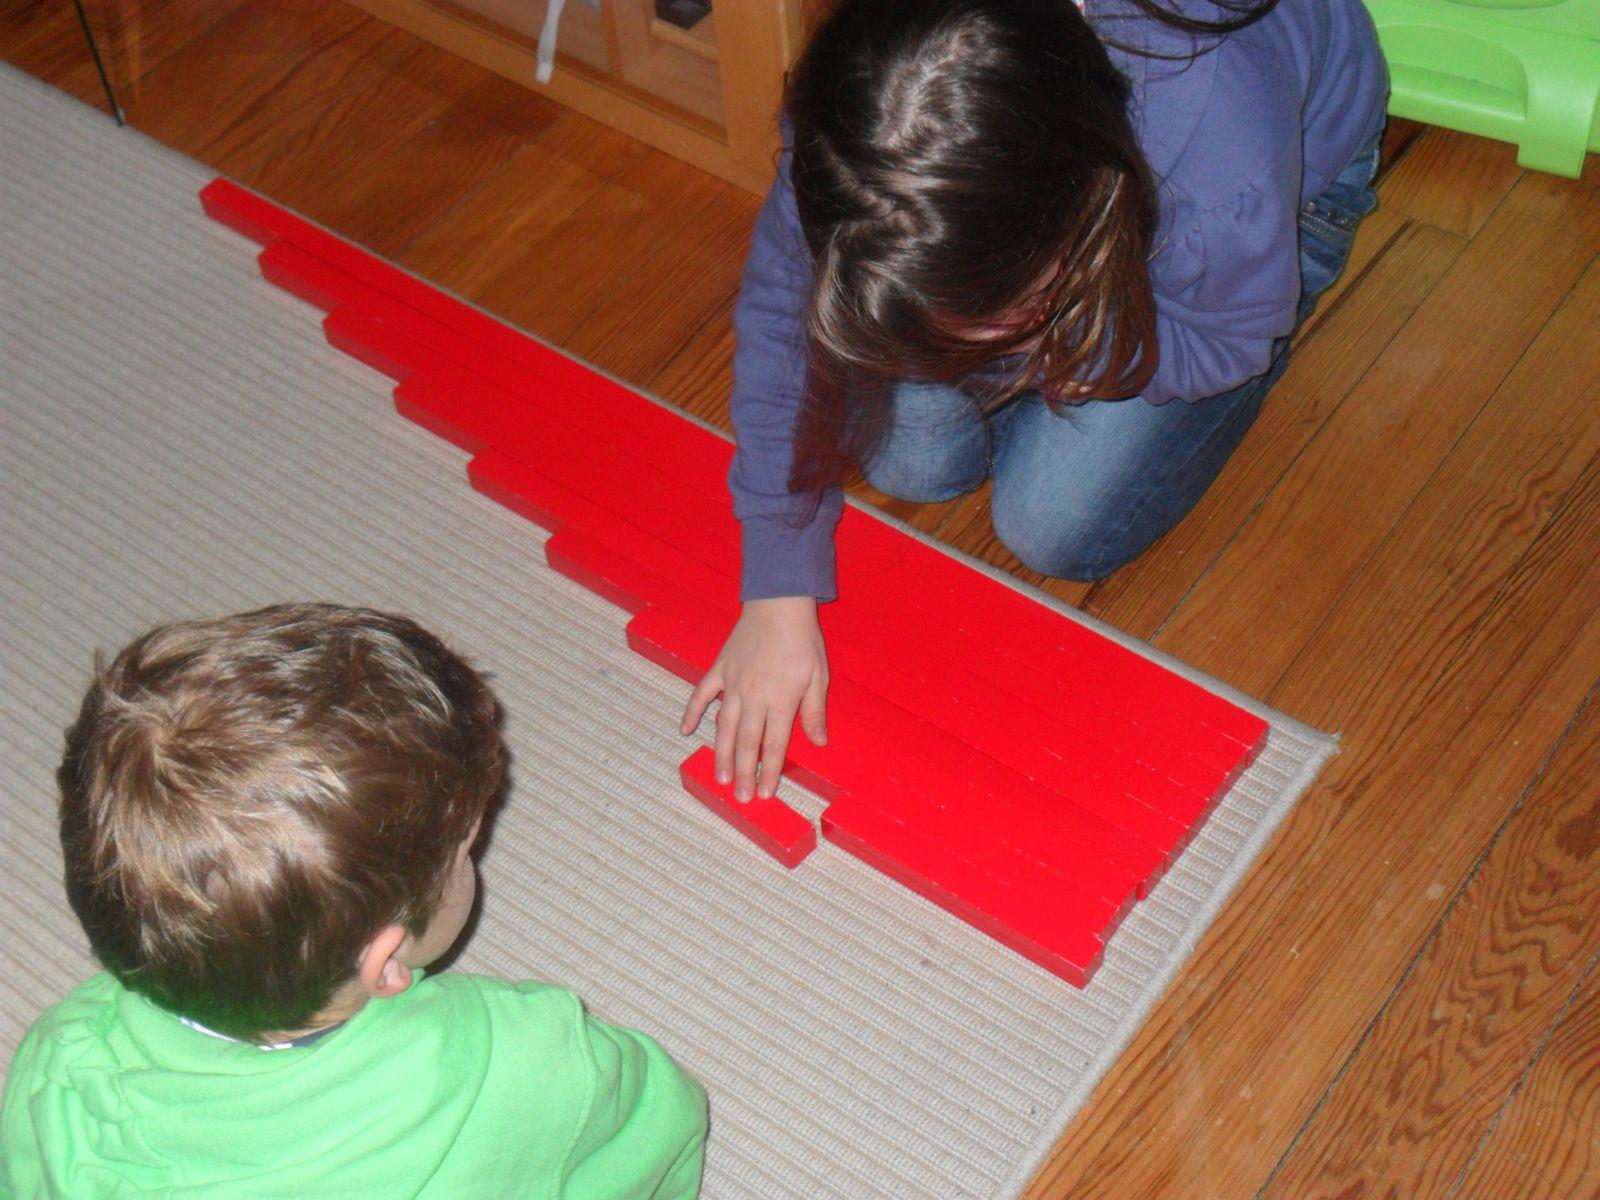 Clara et les barres rouges